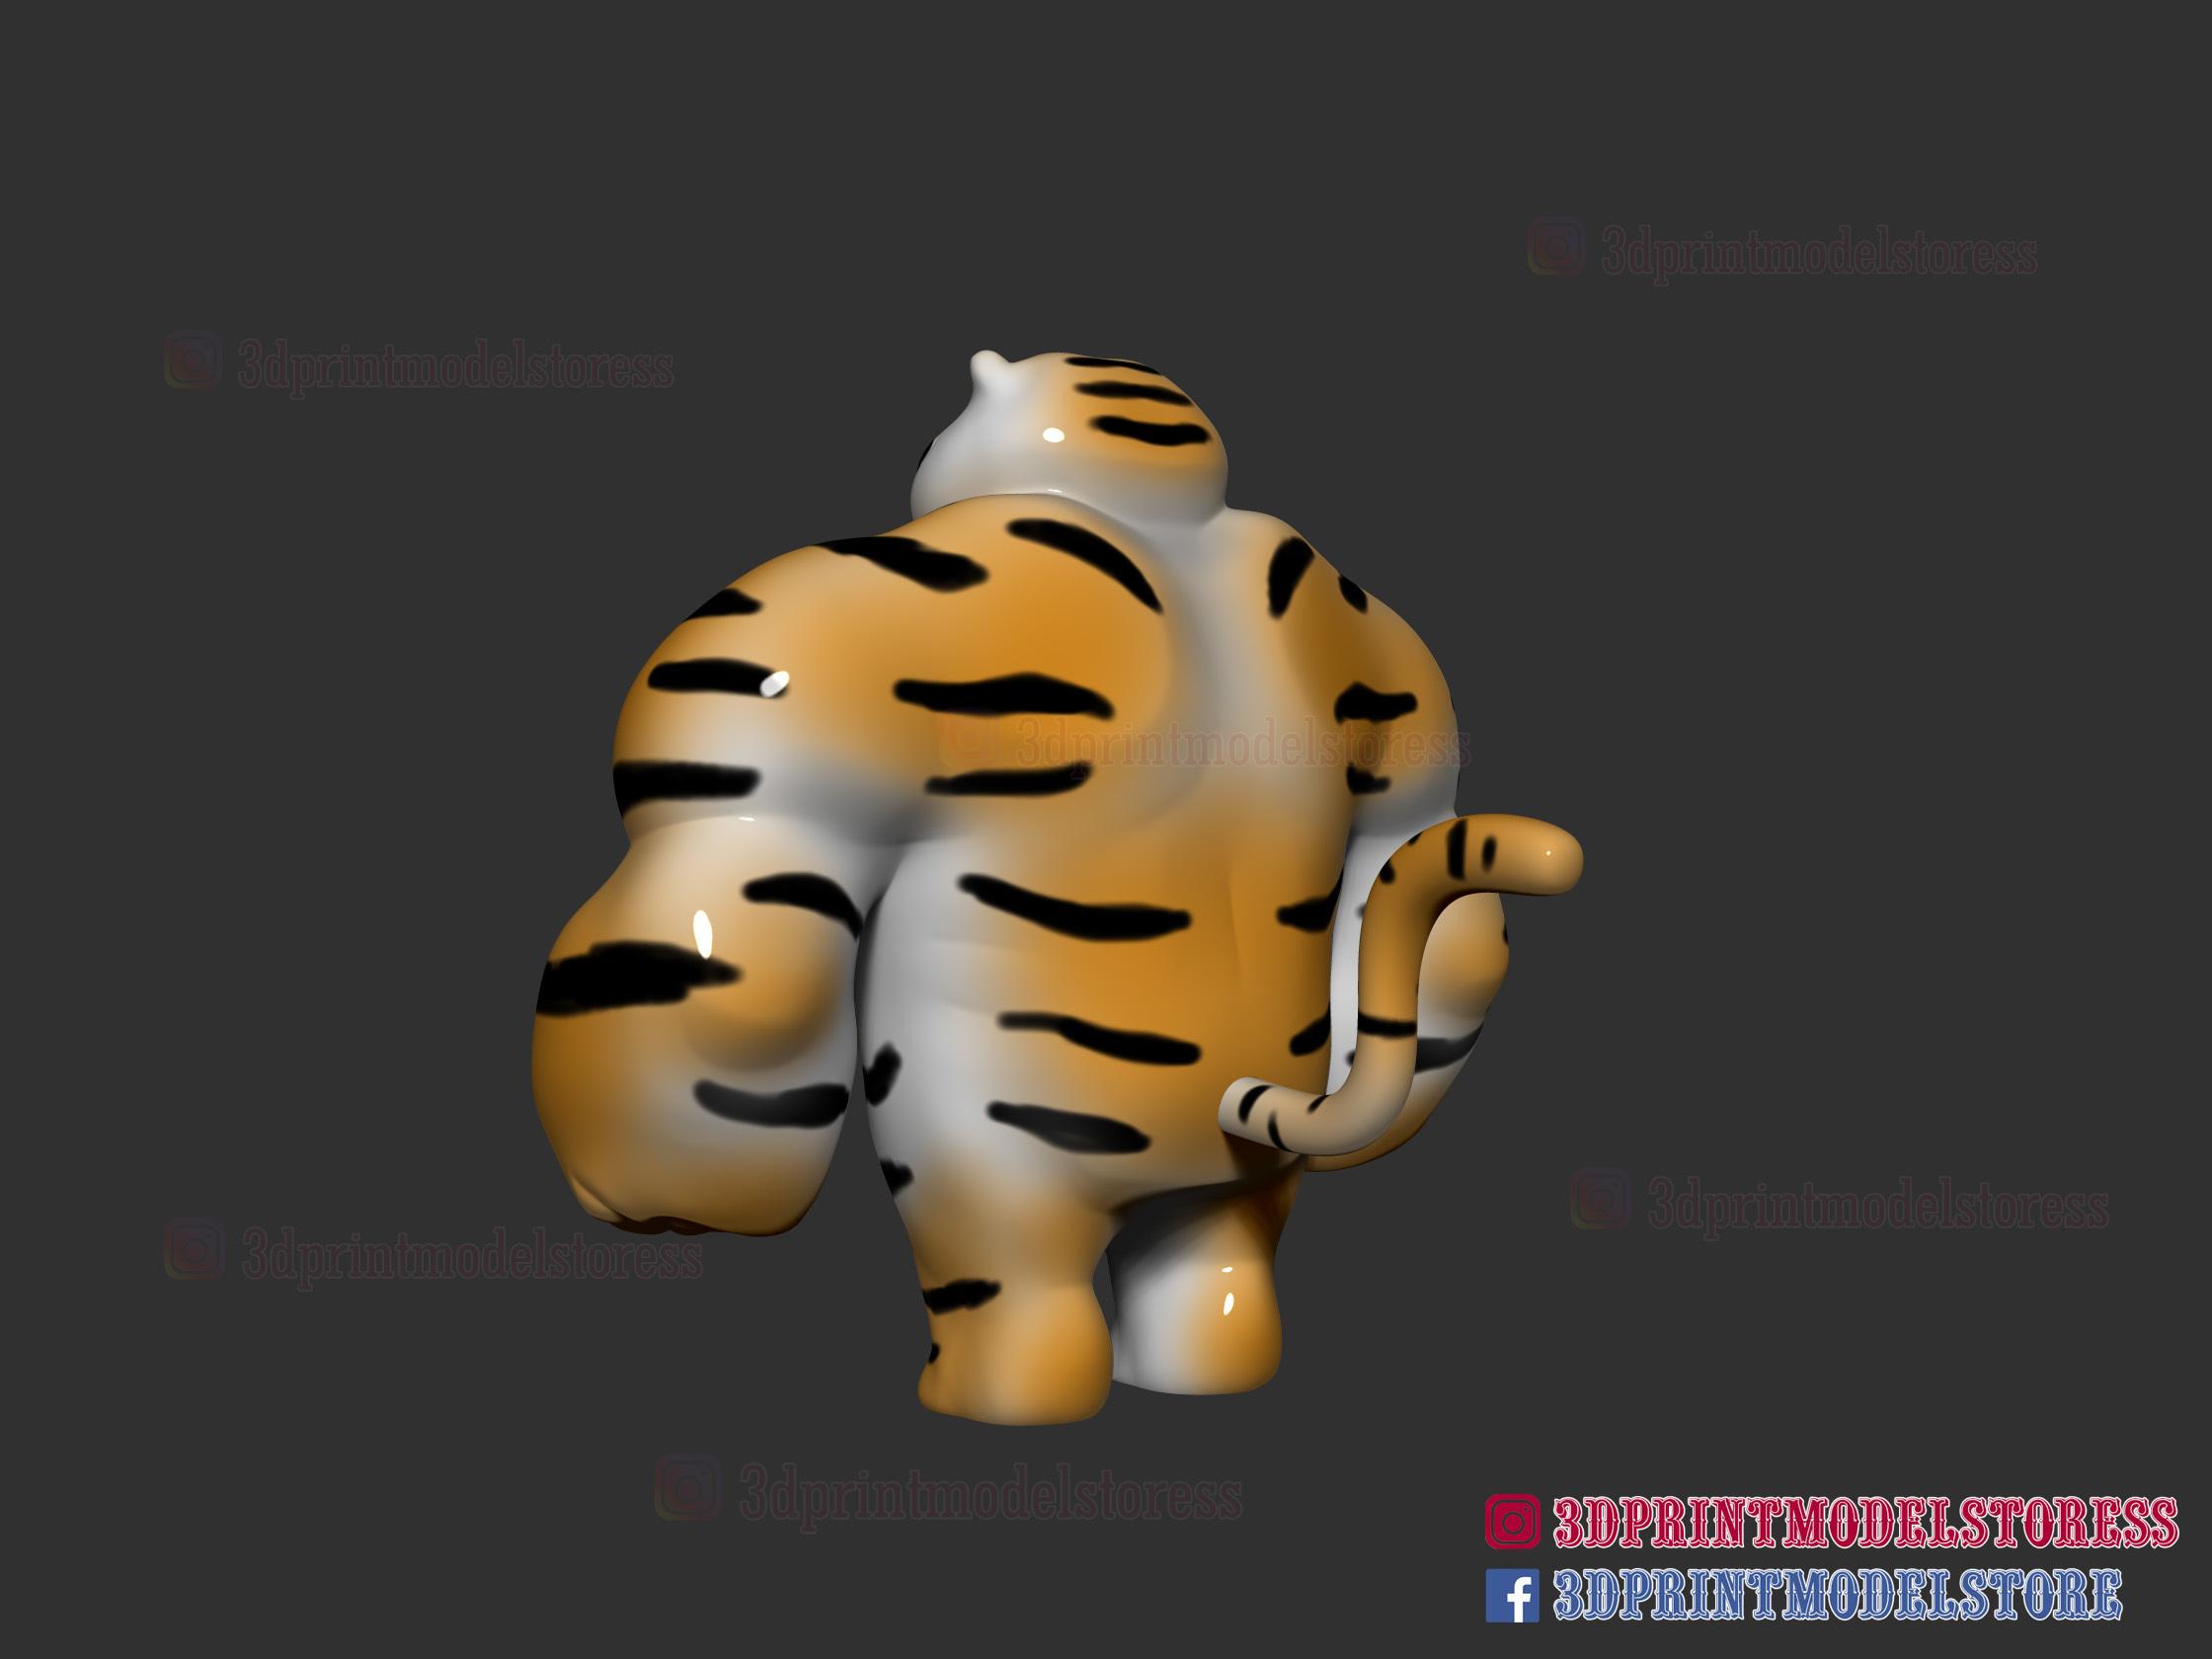 Tiger-muscle-meme-04.jpg Download STL file Tiger Muscle Meme - Swole Tiger Cute Gift • 3D print design, 3DPrintModelStoreSS